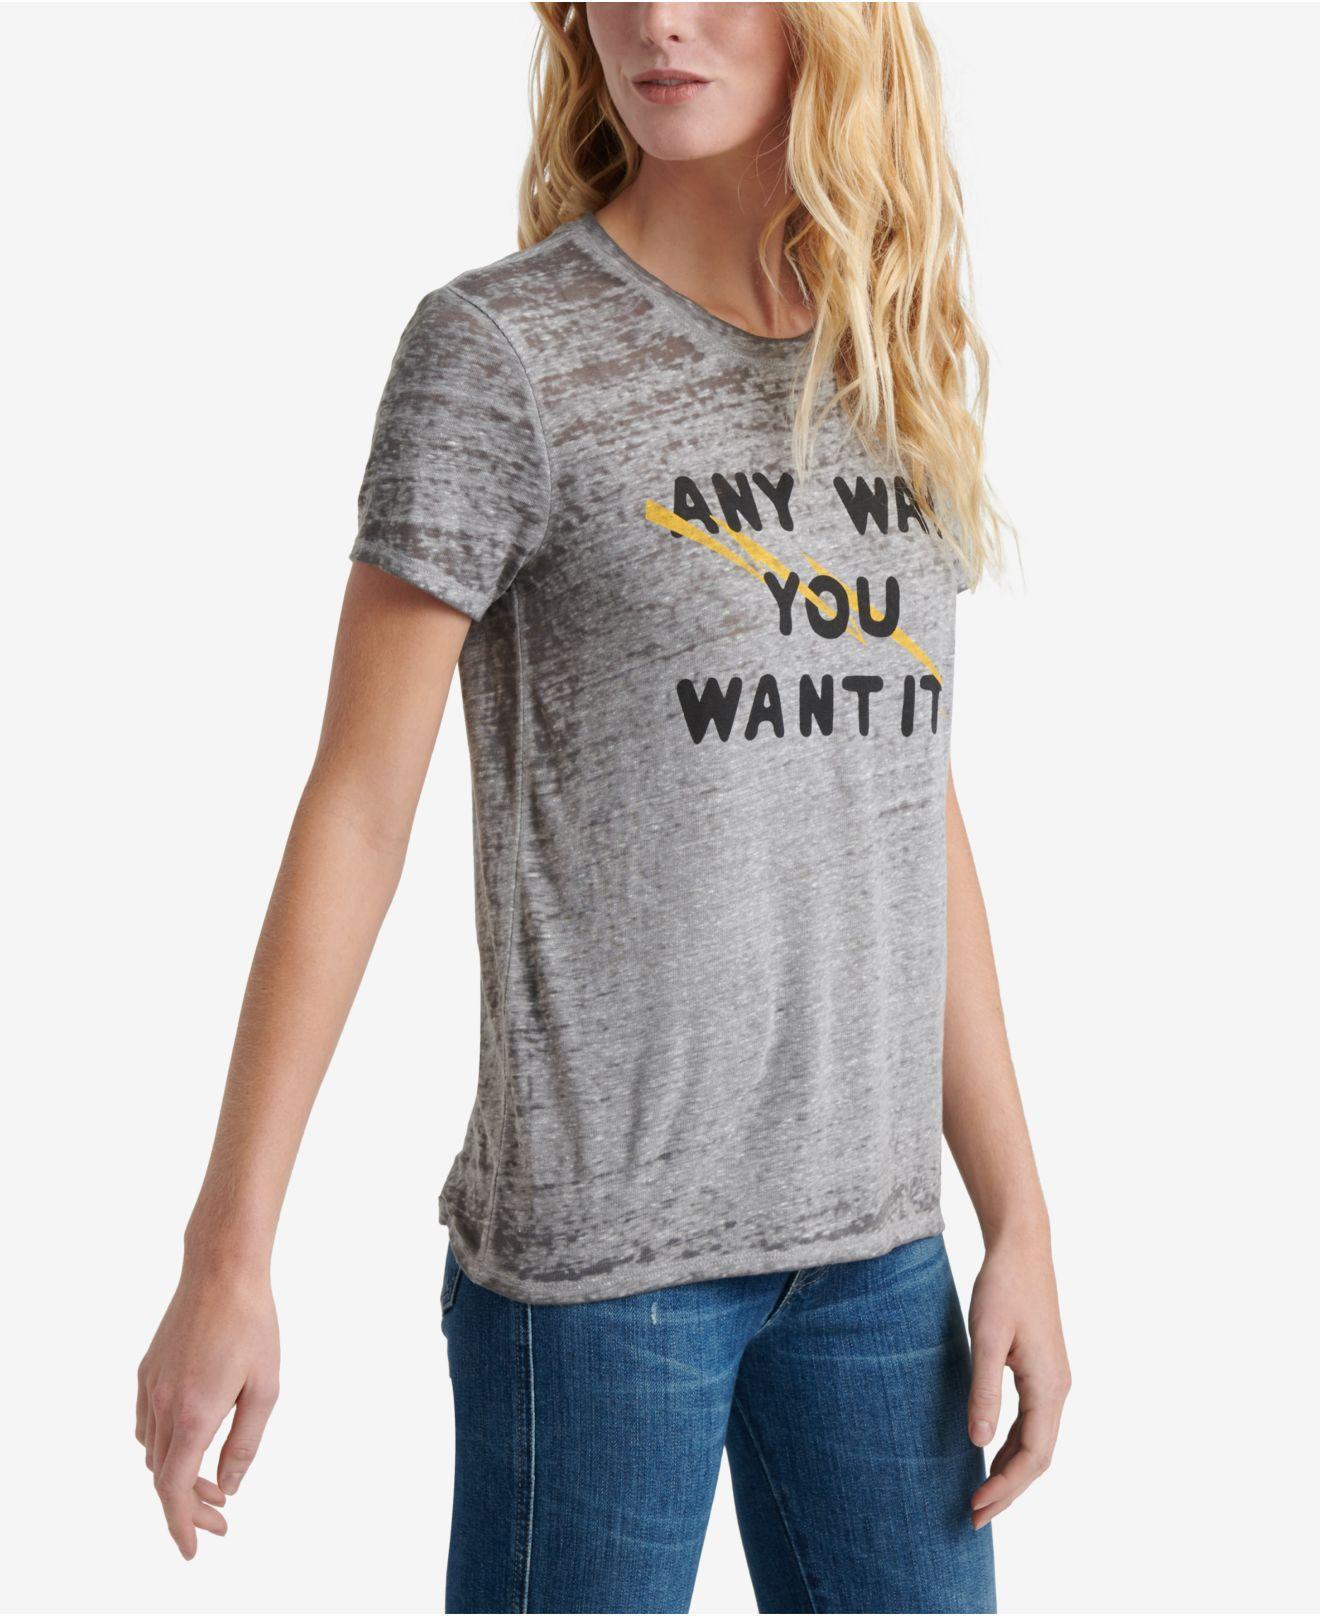 641e8d804 Lucky Brand - Gray Journey Graphic Band T-shirt - Lyst. View fullscreen